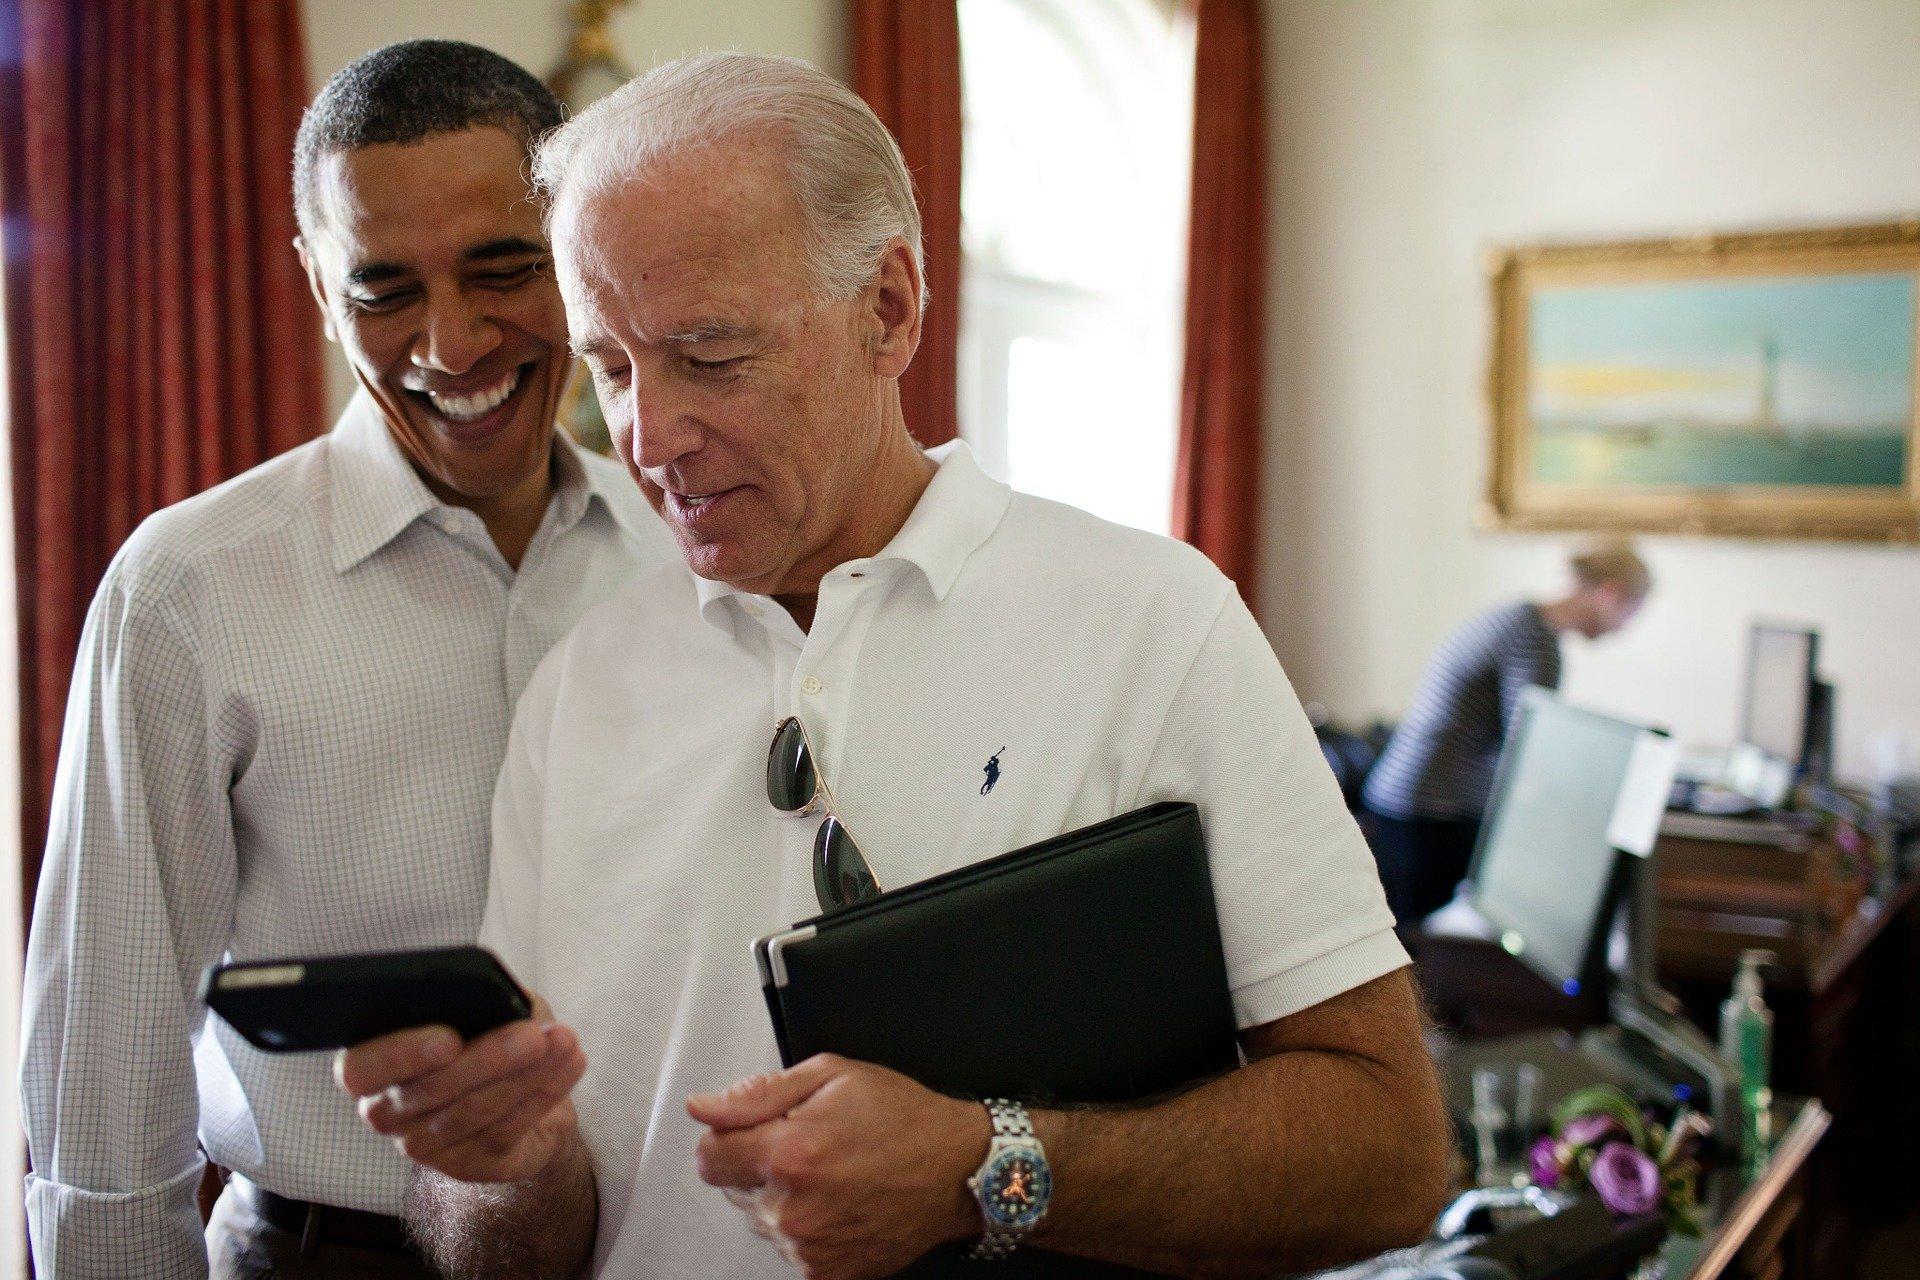 Super Tuesday: Rivalen unterstützen jetzt Joe Biden